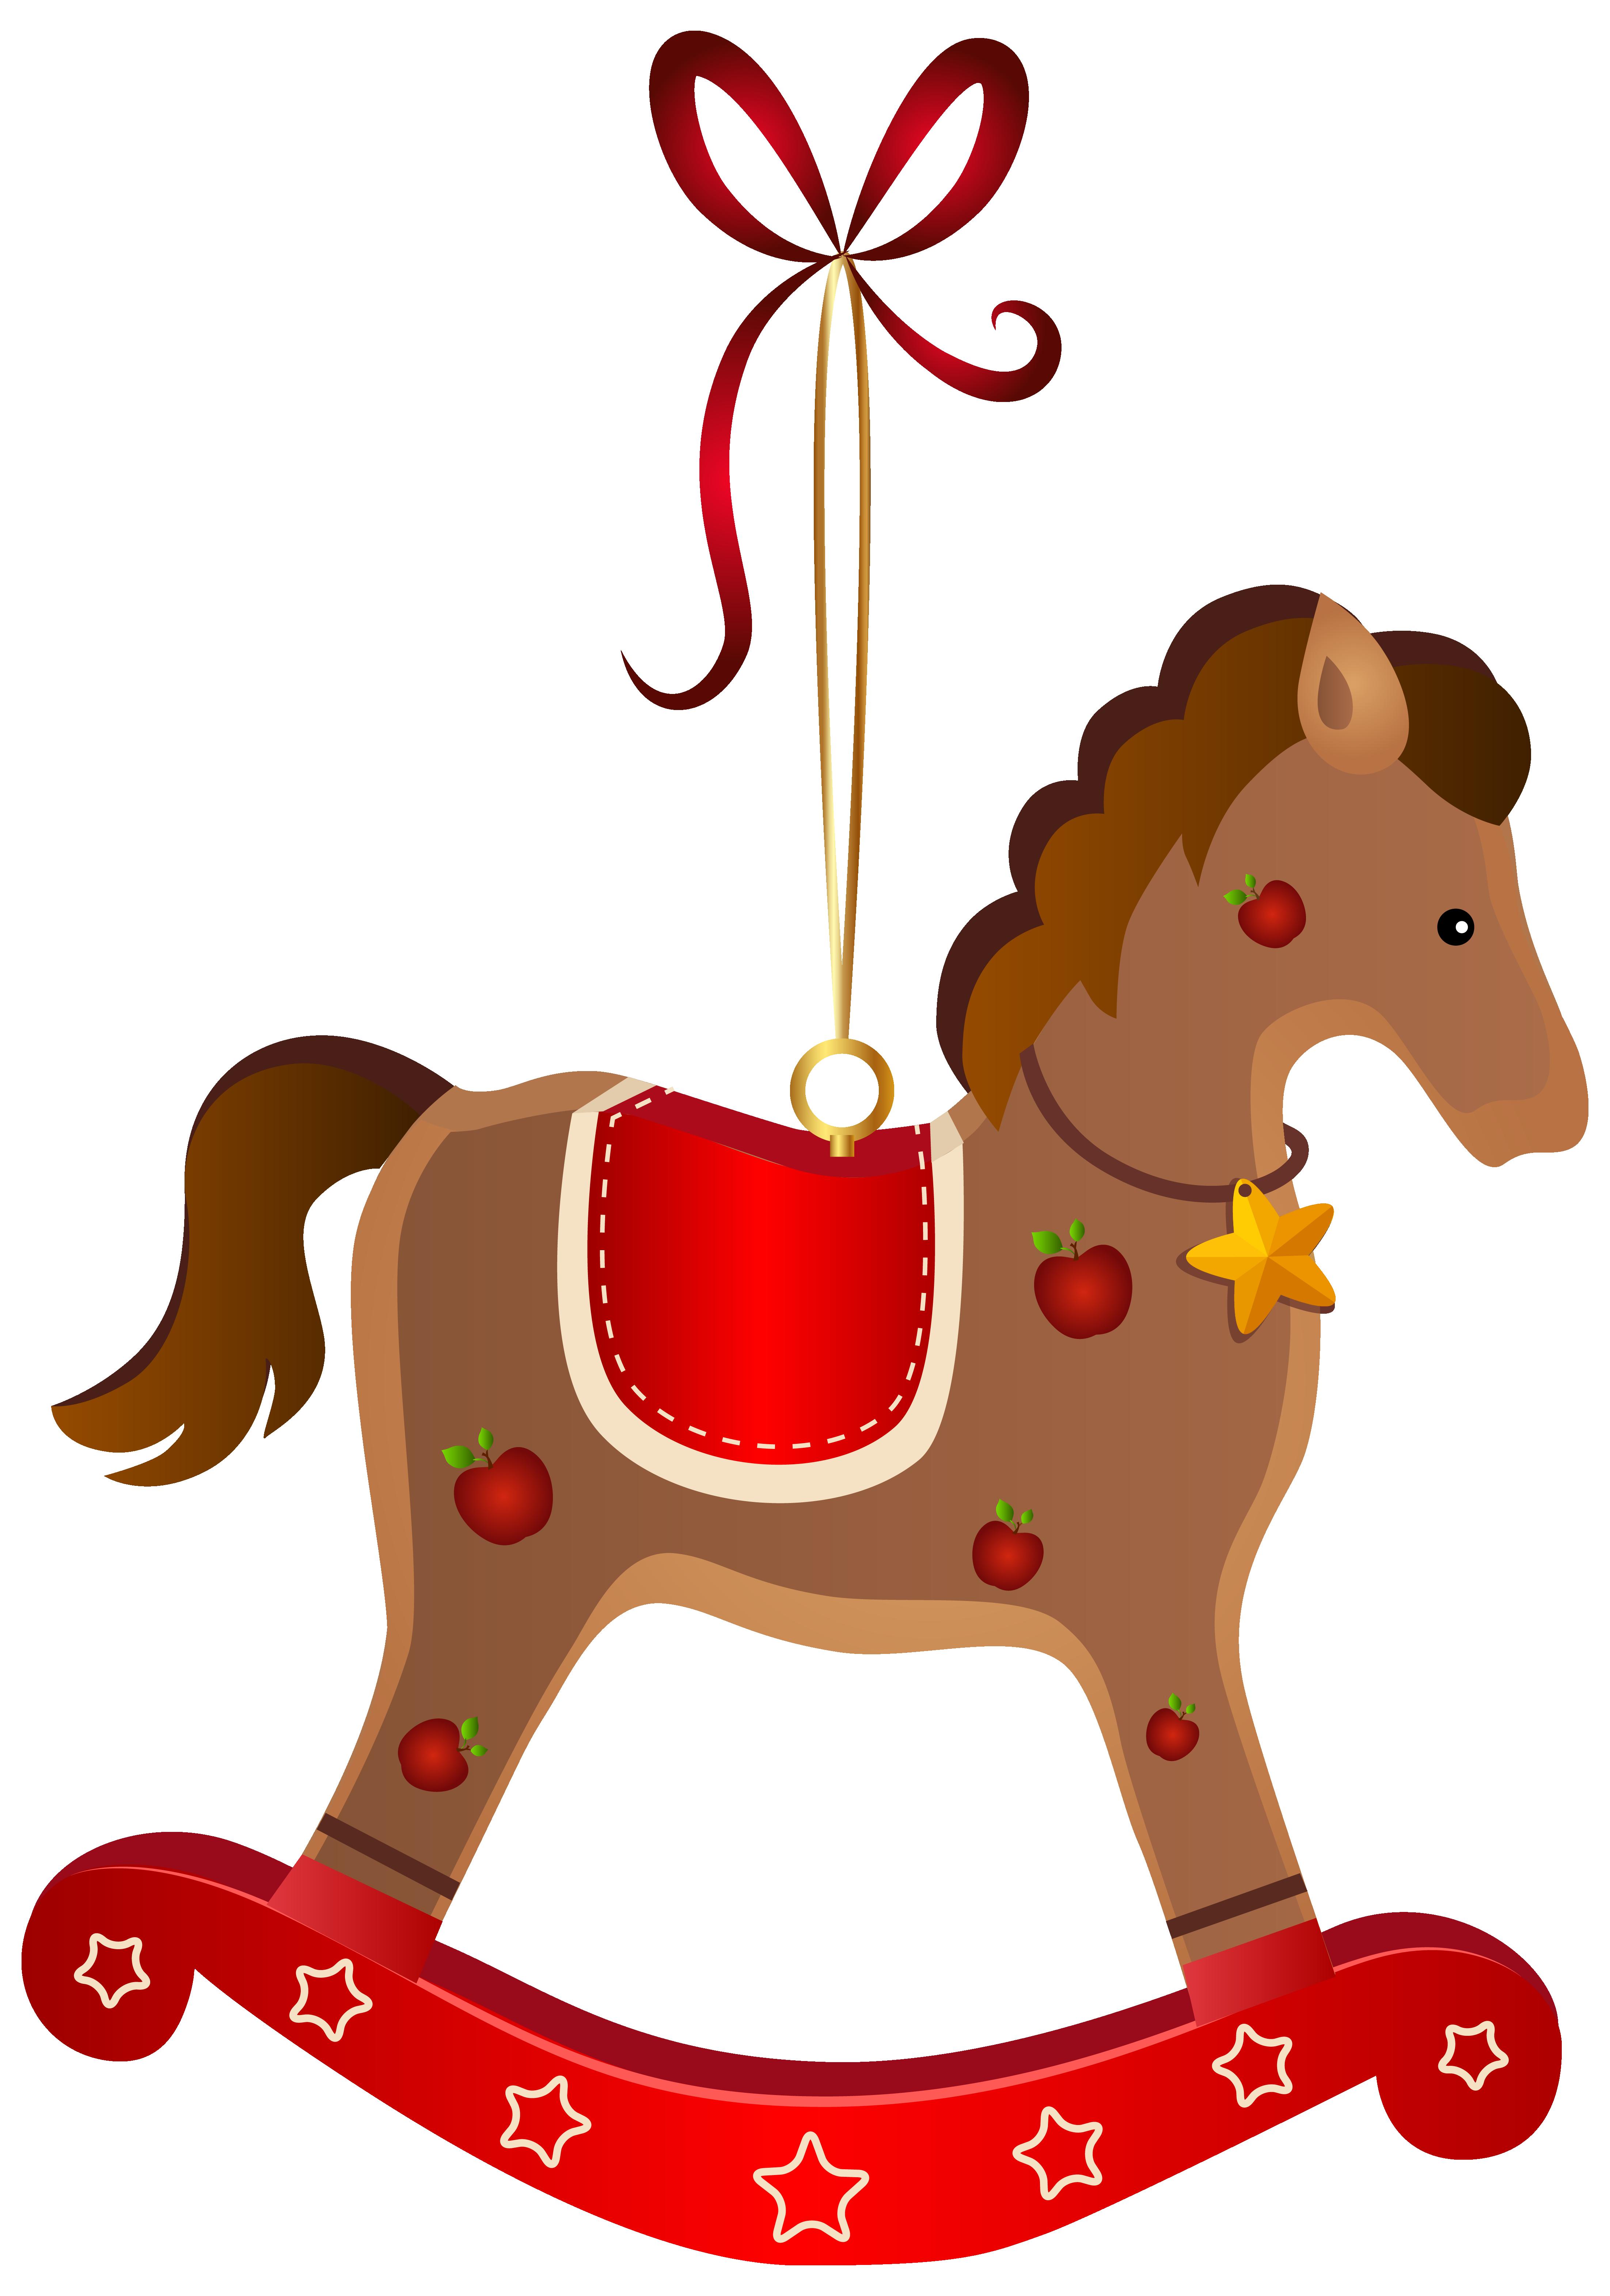 4406x6283 Rocking Horse Christmas Ornament Transparent Png Clip Art Image